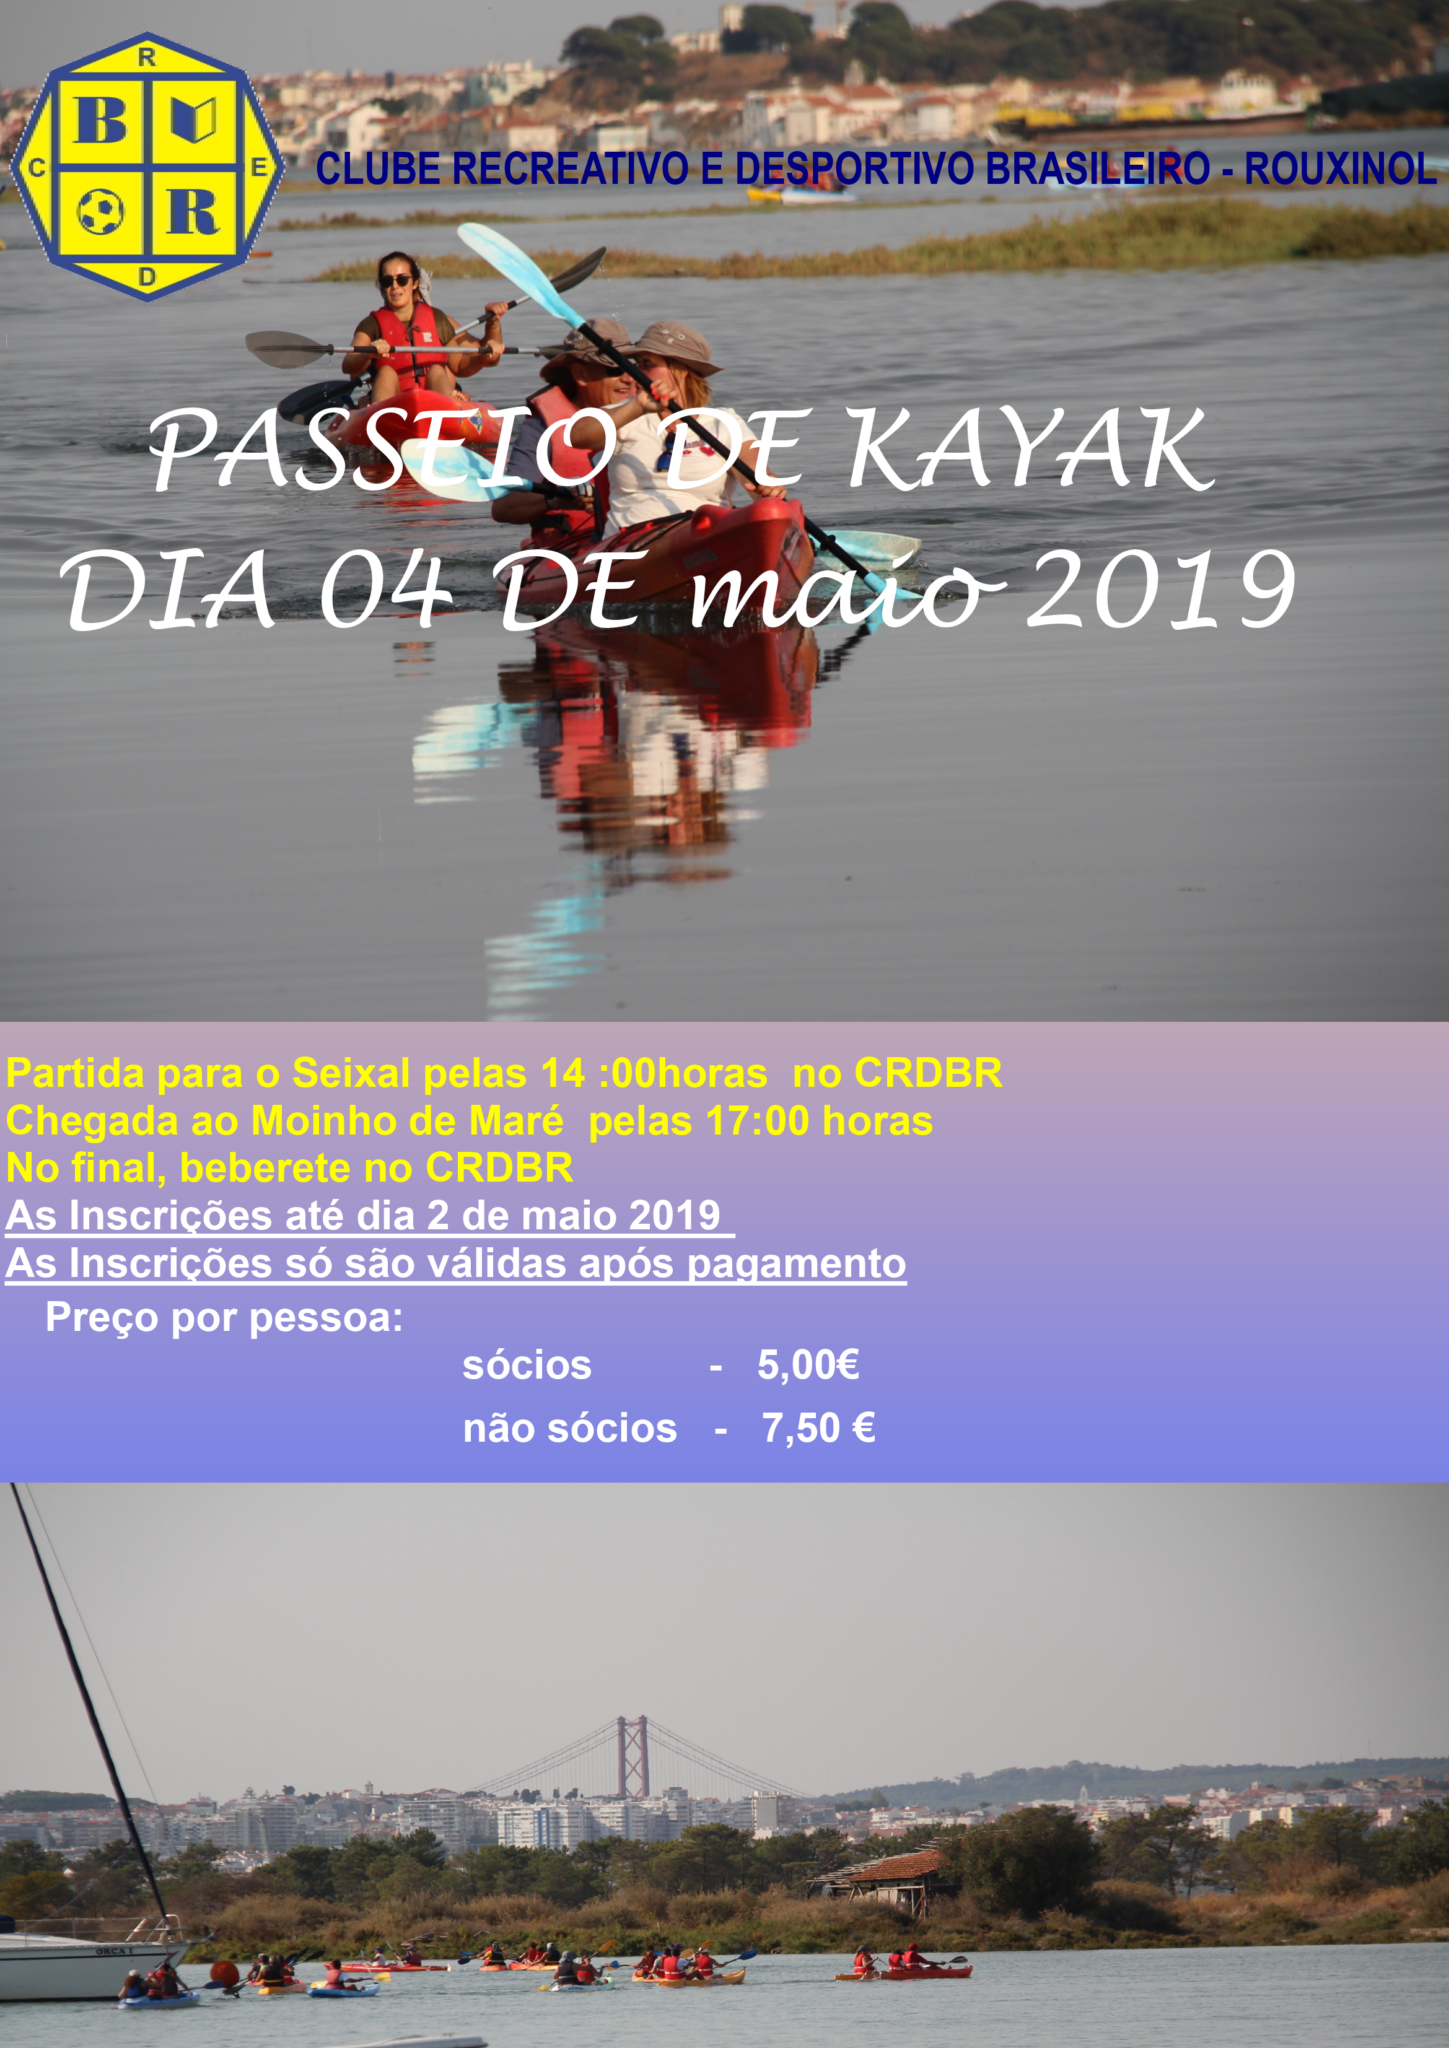 Passeio de kayak dia 4 de maio 2019! Participa!